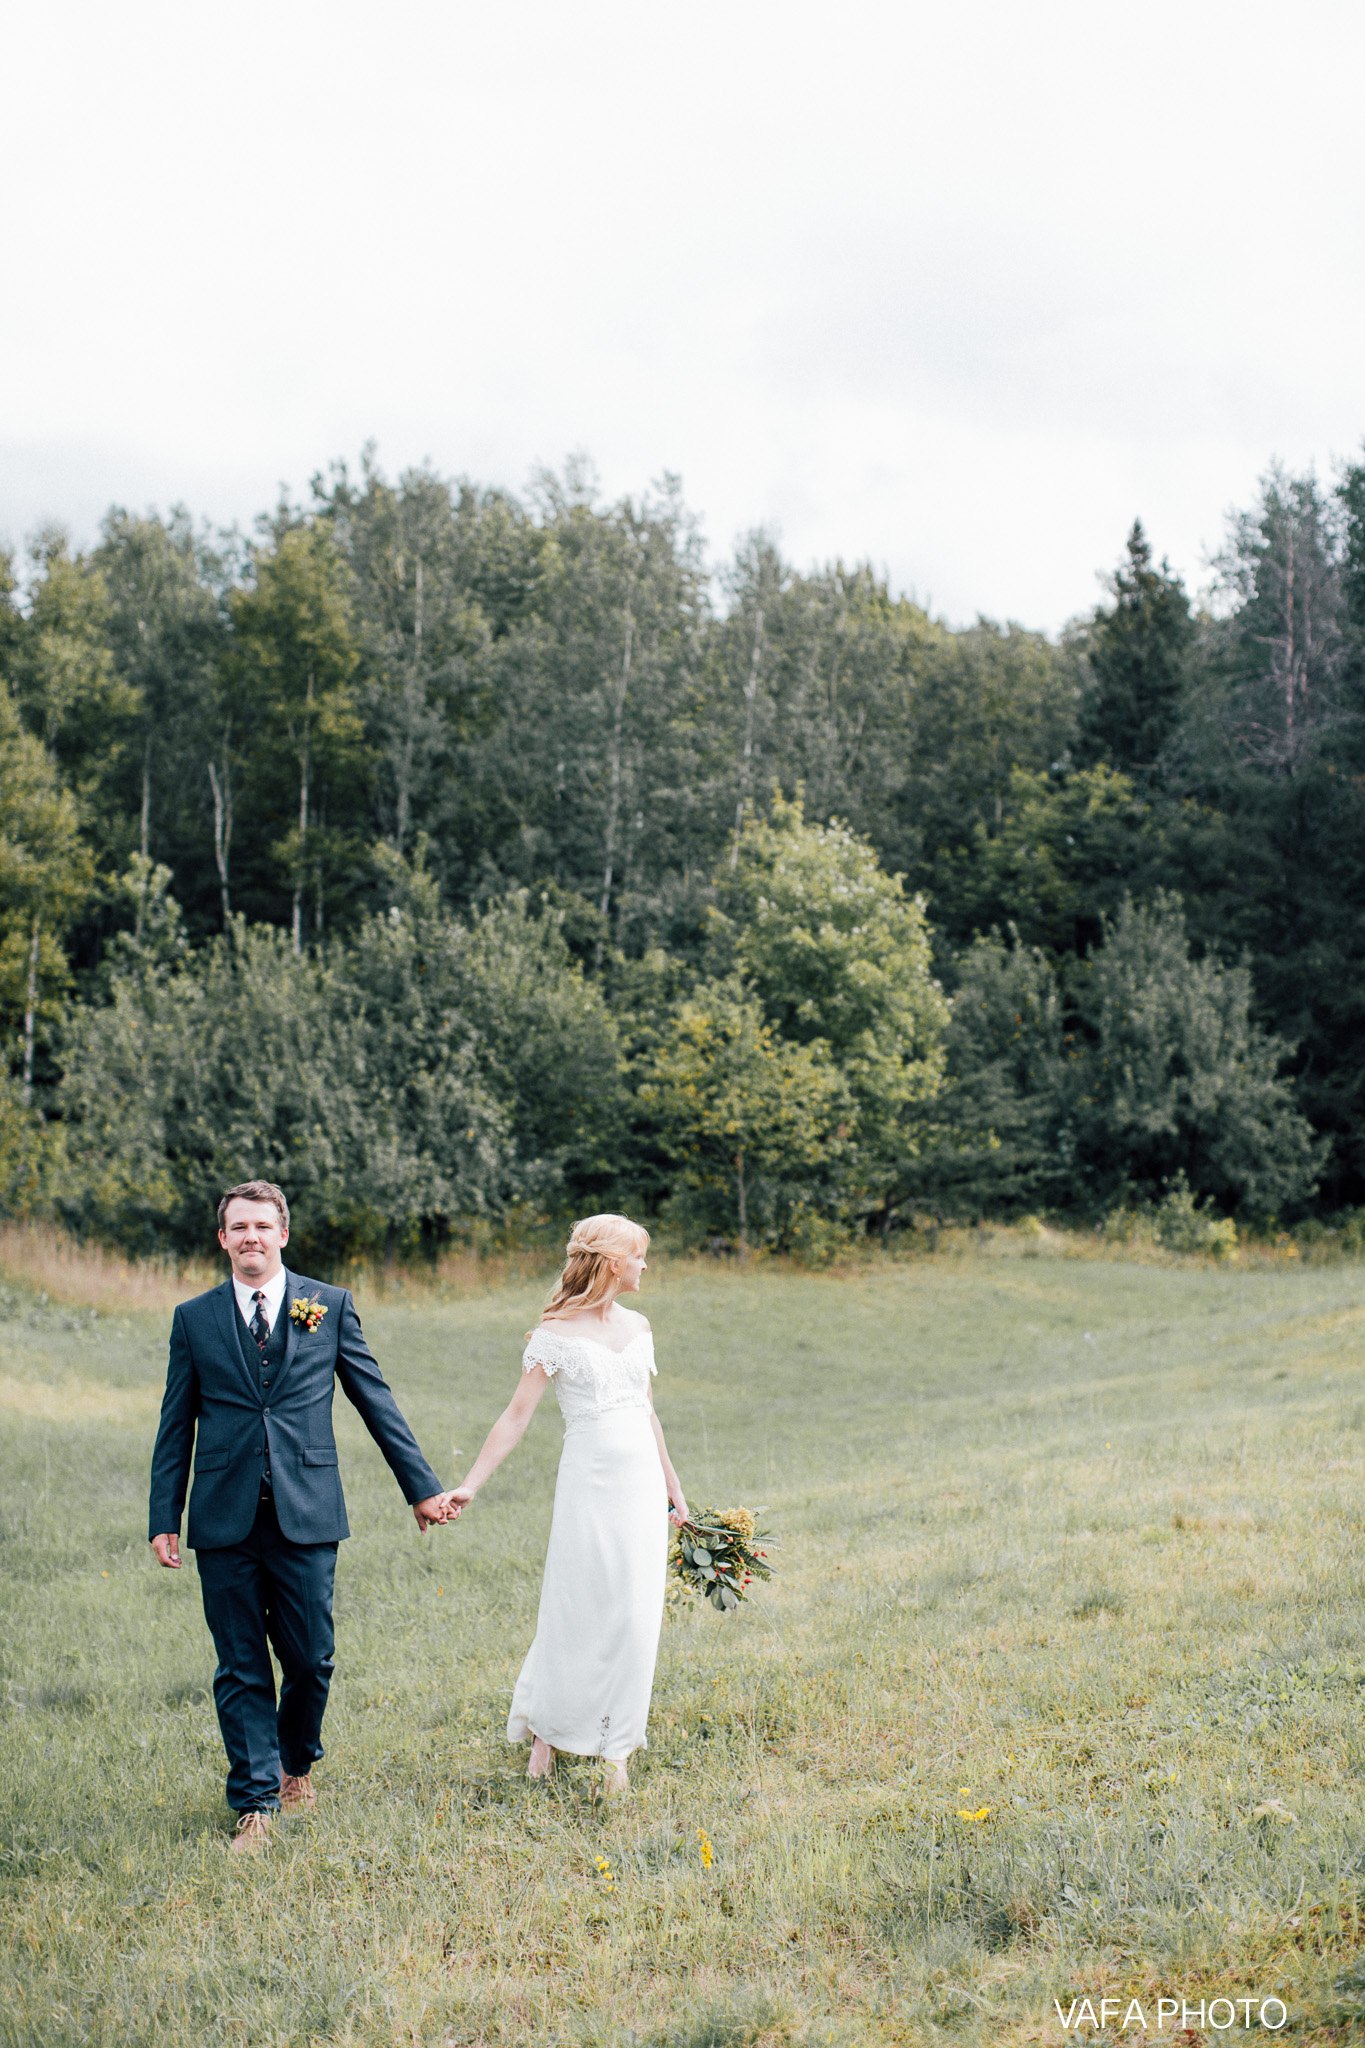 Belsolda-Farm-Wedding-Christy-Eric-Vafa-Photo-159.jpg